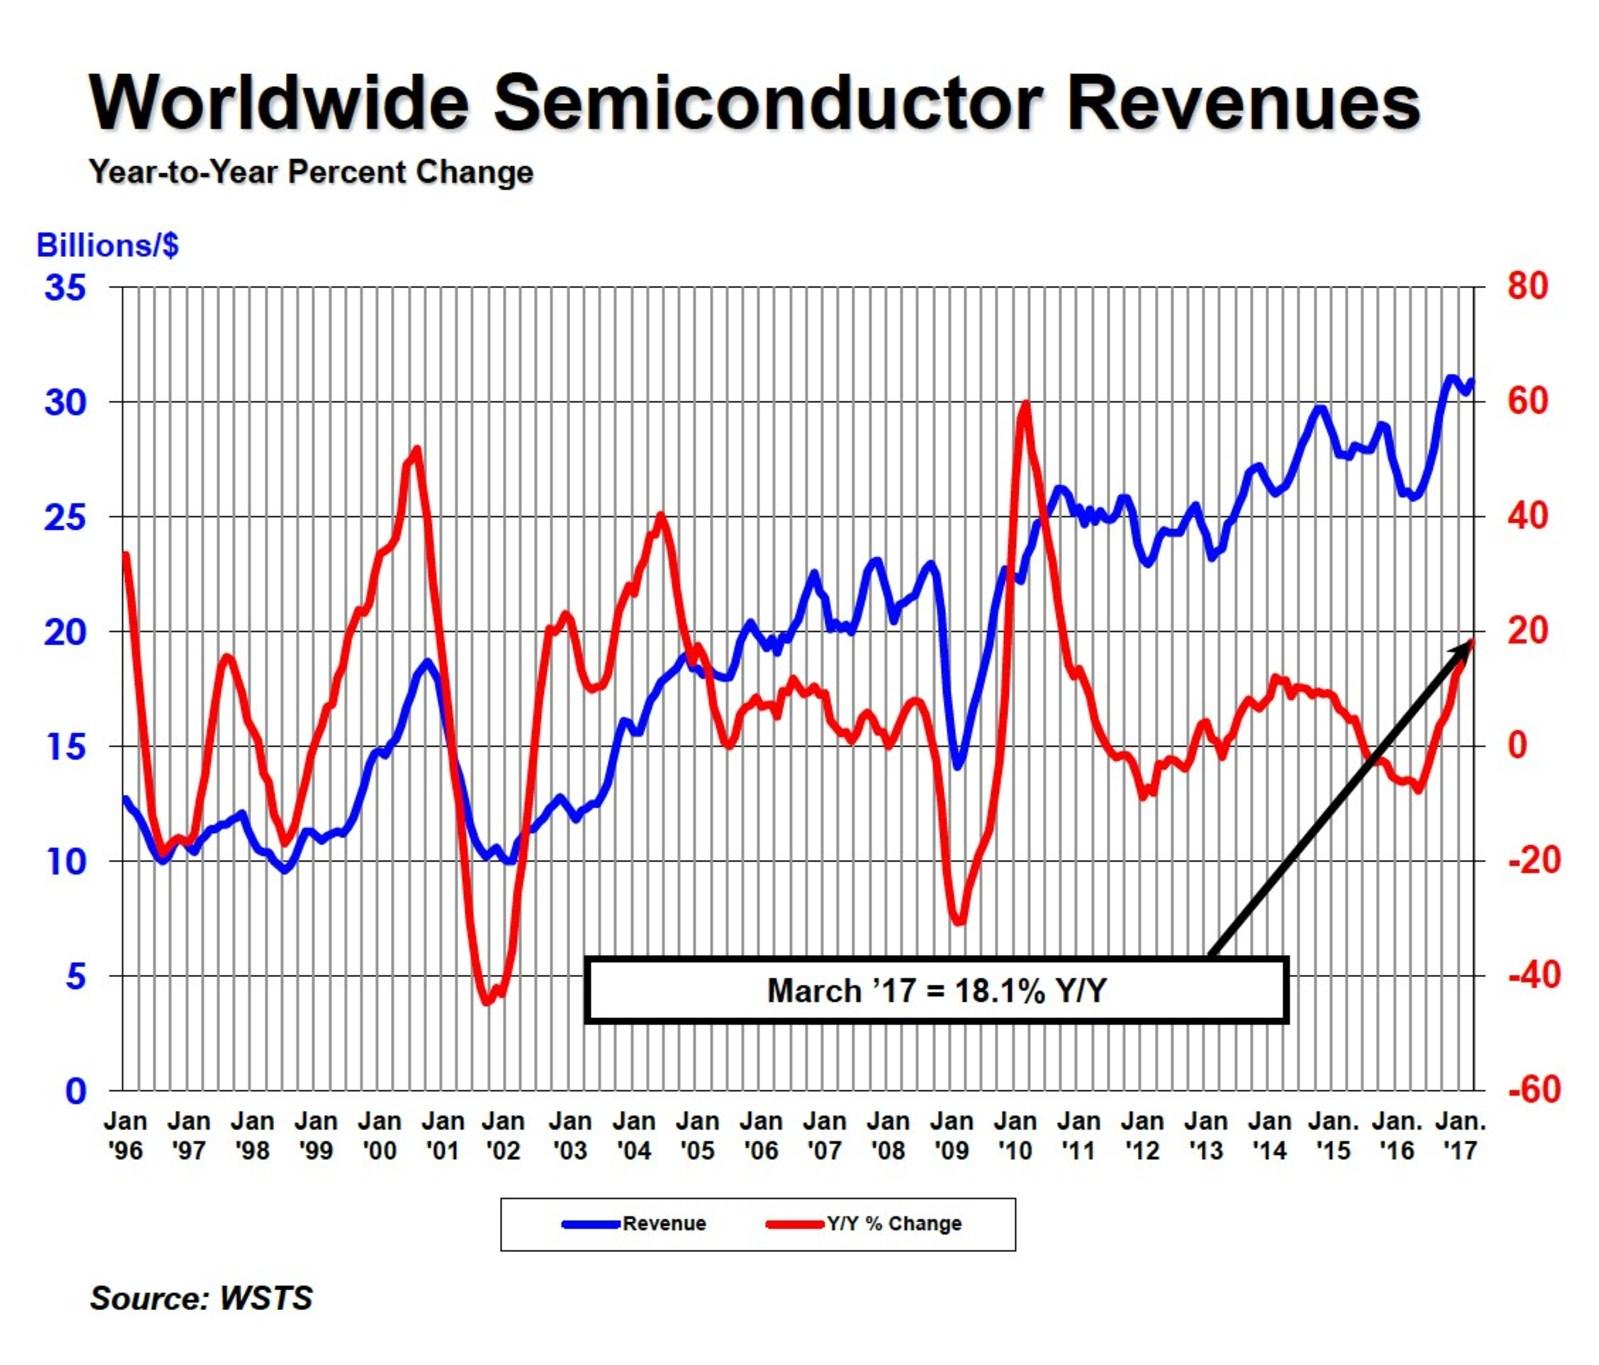 World semiconductor revenues through March 2017 (PRNewsfoto/Semiconductor Industry Associat)